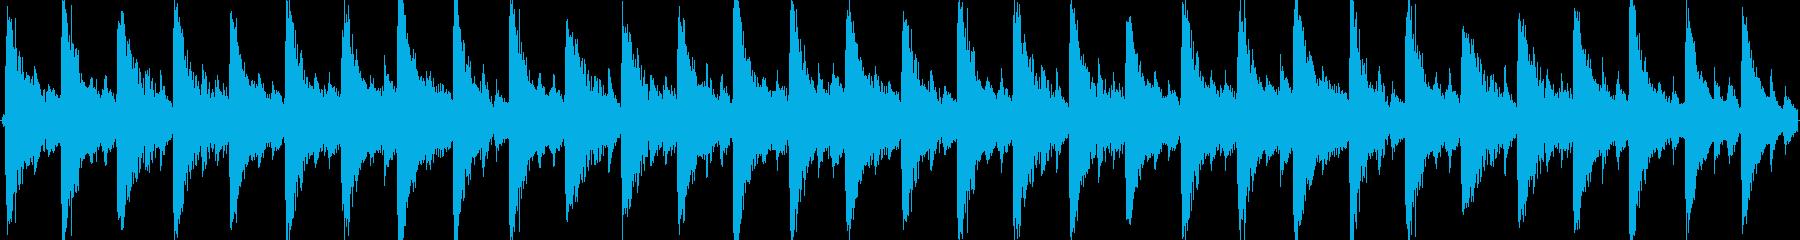 mp3 / 44.1kHz / 320…の再生済みの波形